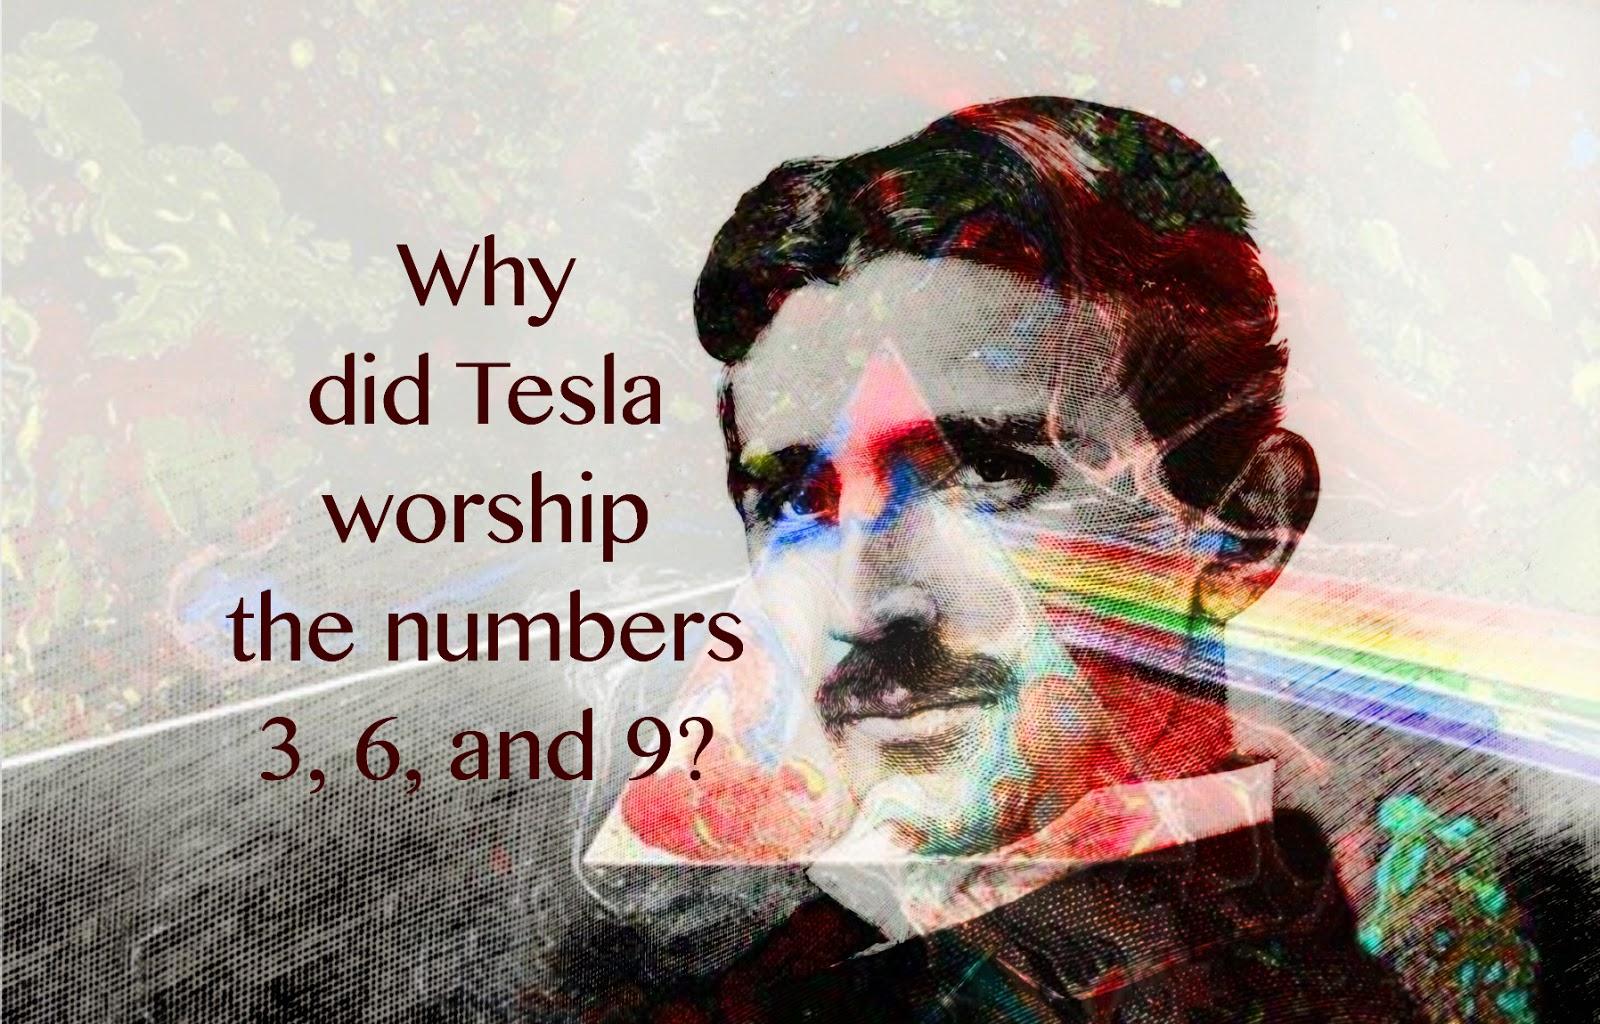 Dreamtime Code: Illuminati Alphabet Conspiracy: Nikola Tesla May